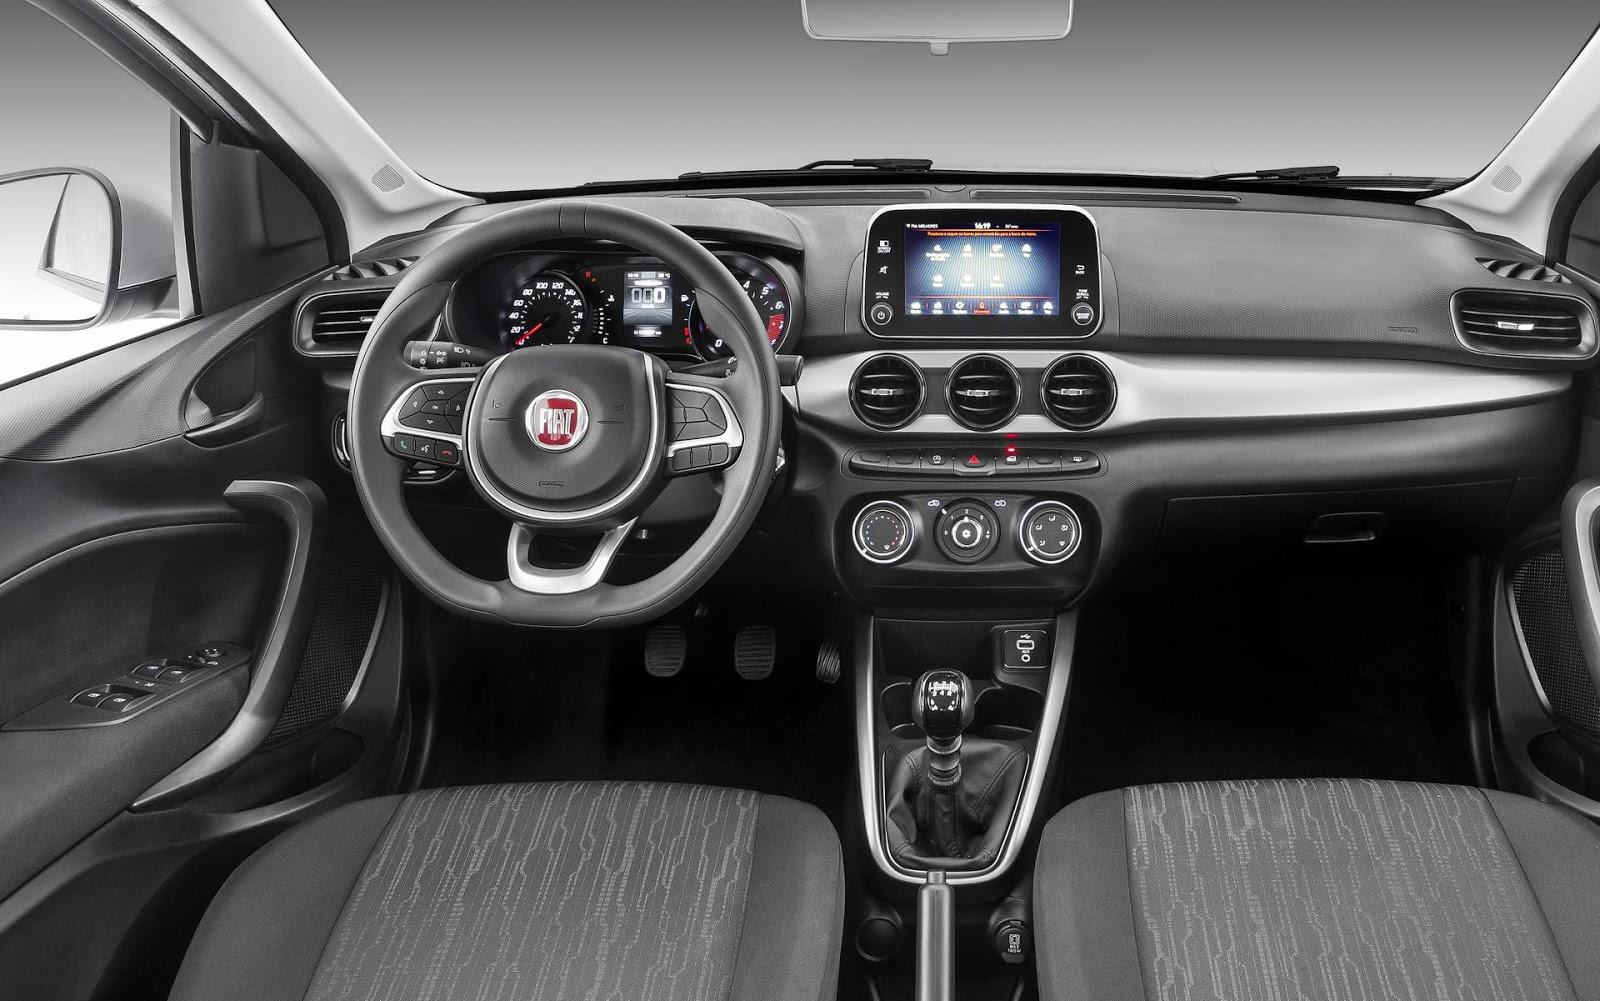 Sobre Fiat Argo Fiat-Argo-Drive%2B%25282%2529